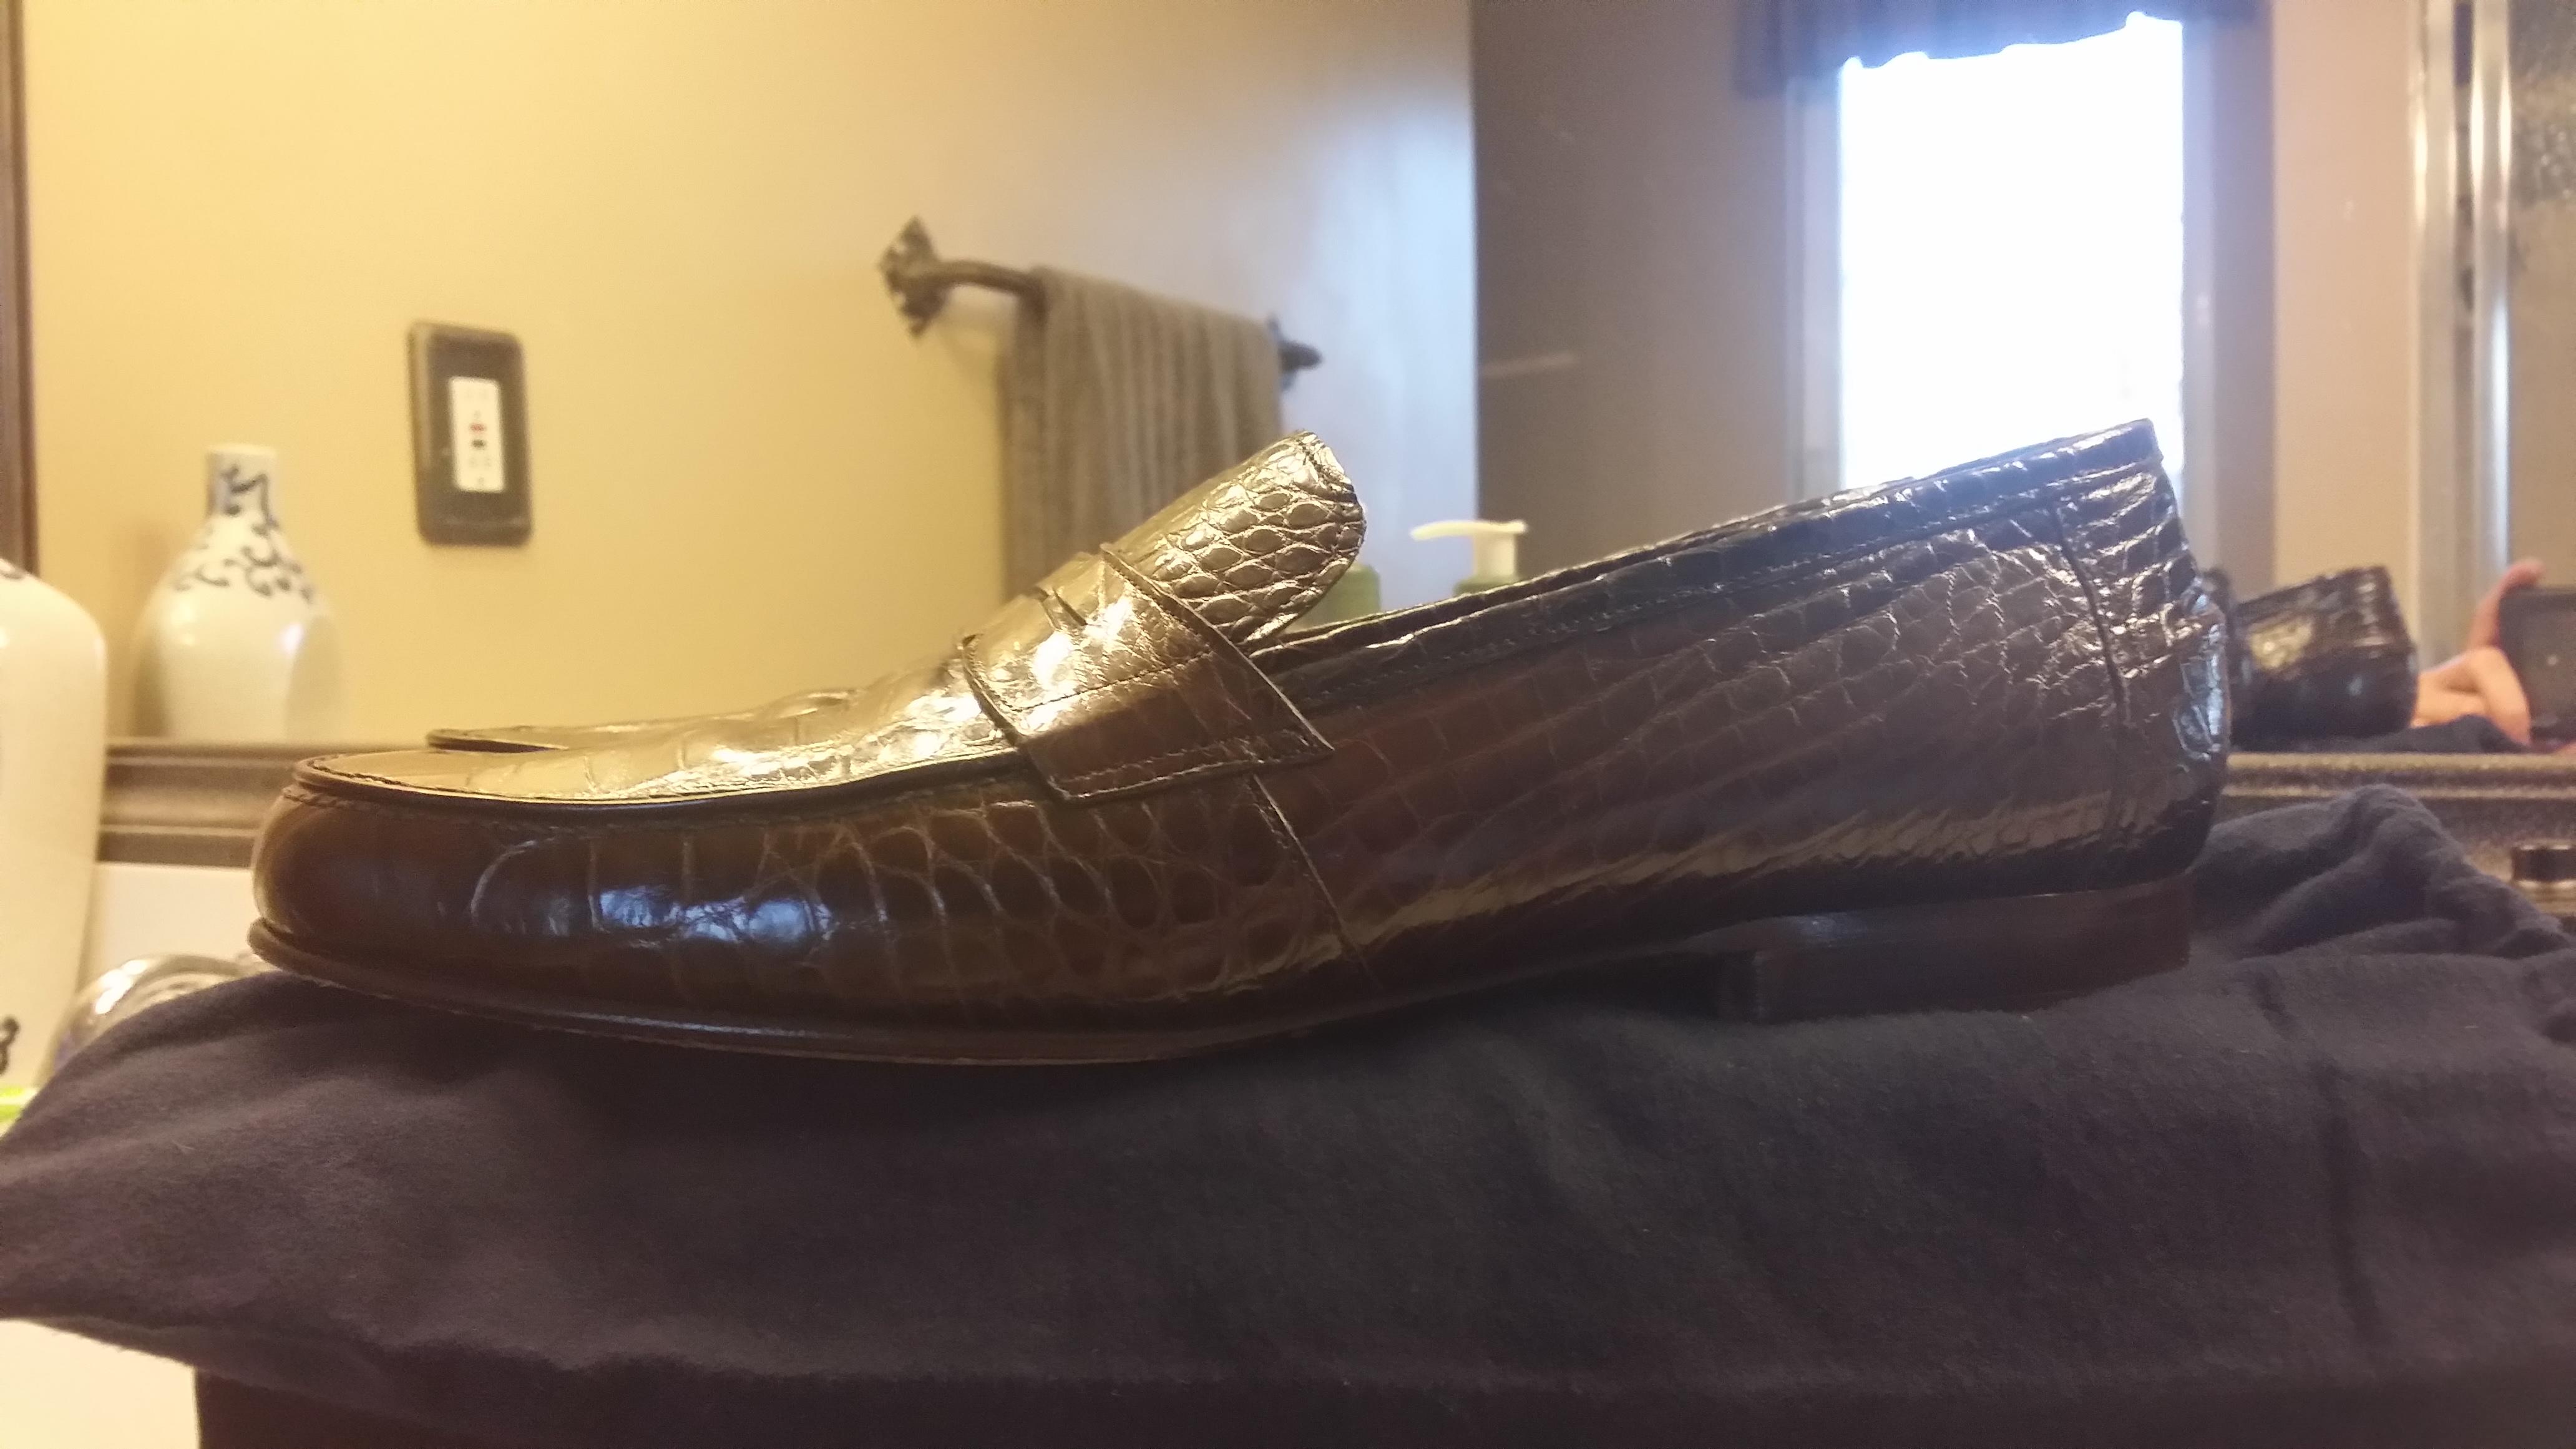 Nismoredlegs's photos in Alligator / Crocodile Shoes